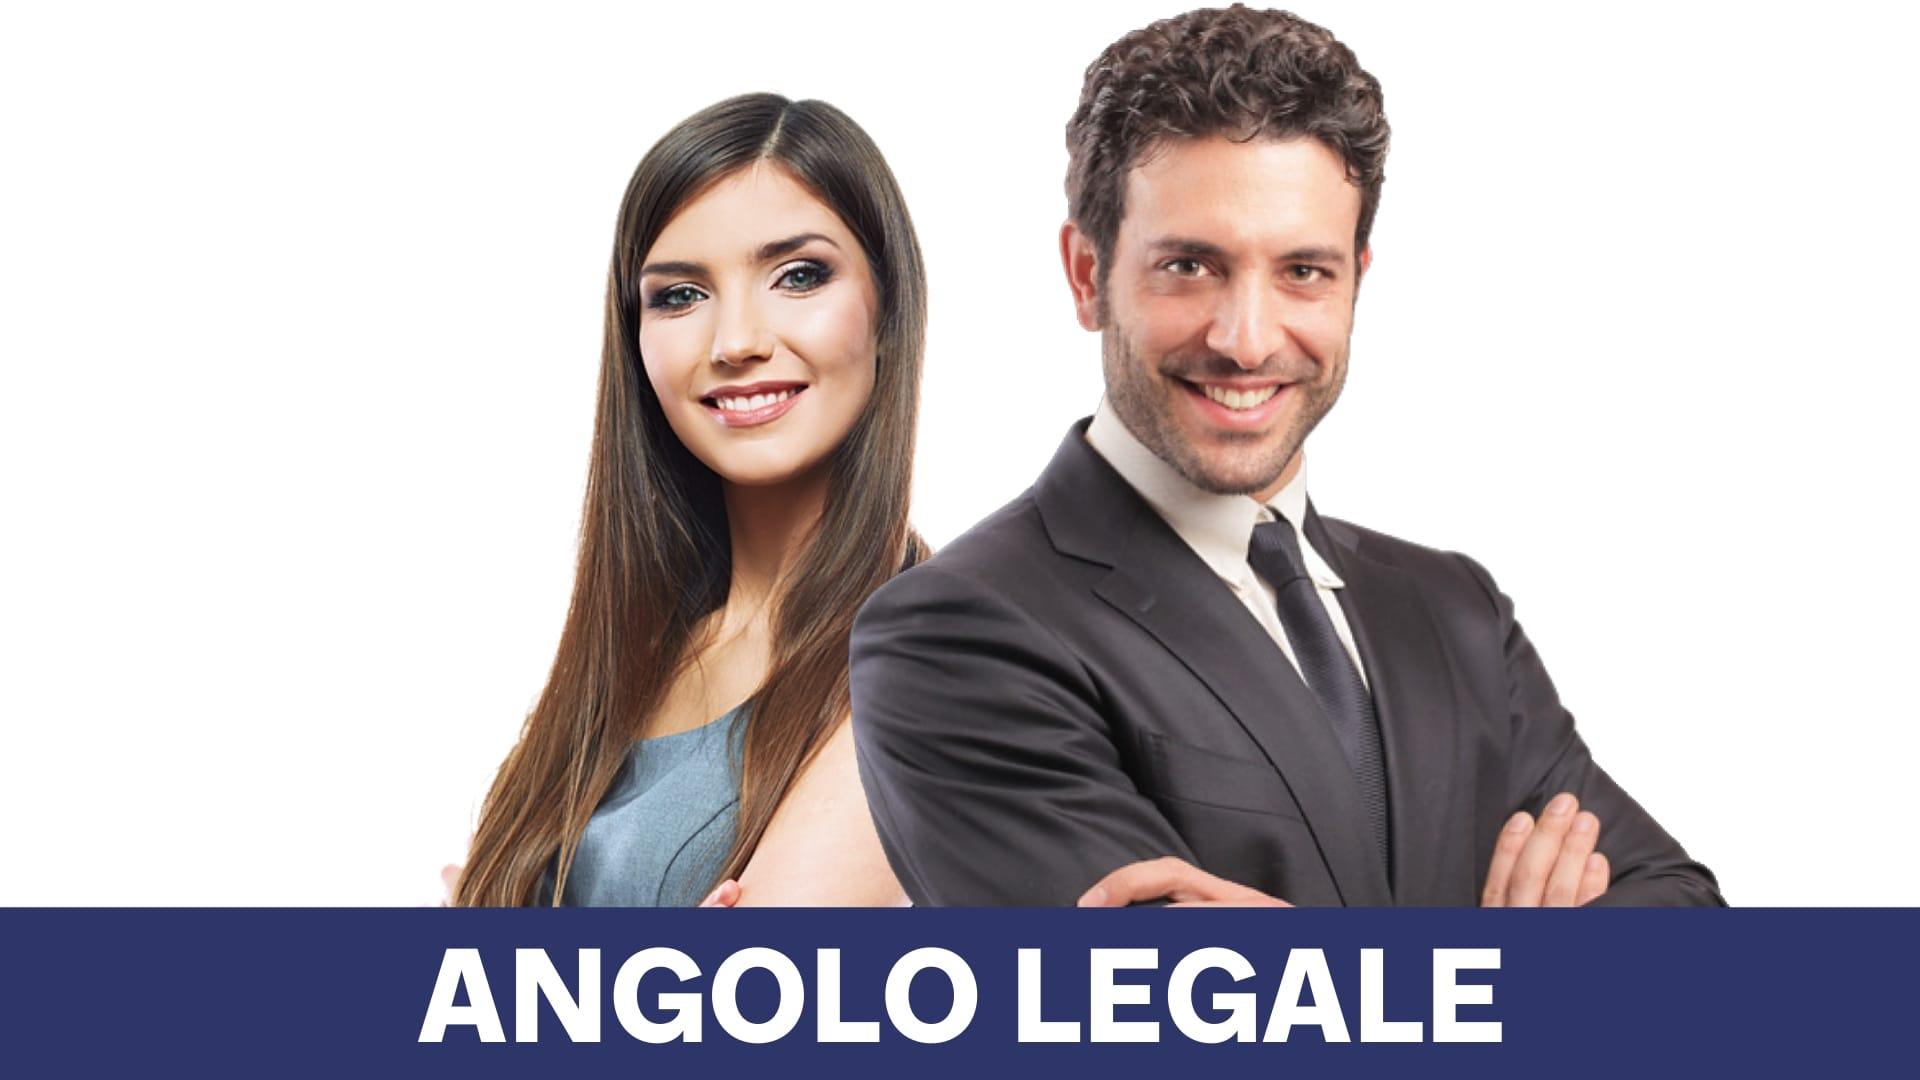 Angolo Legale FIAP  v18